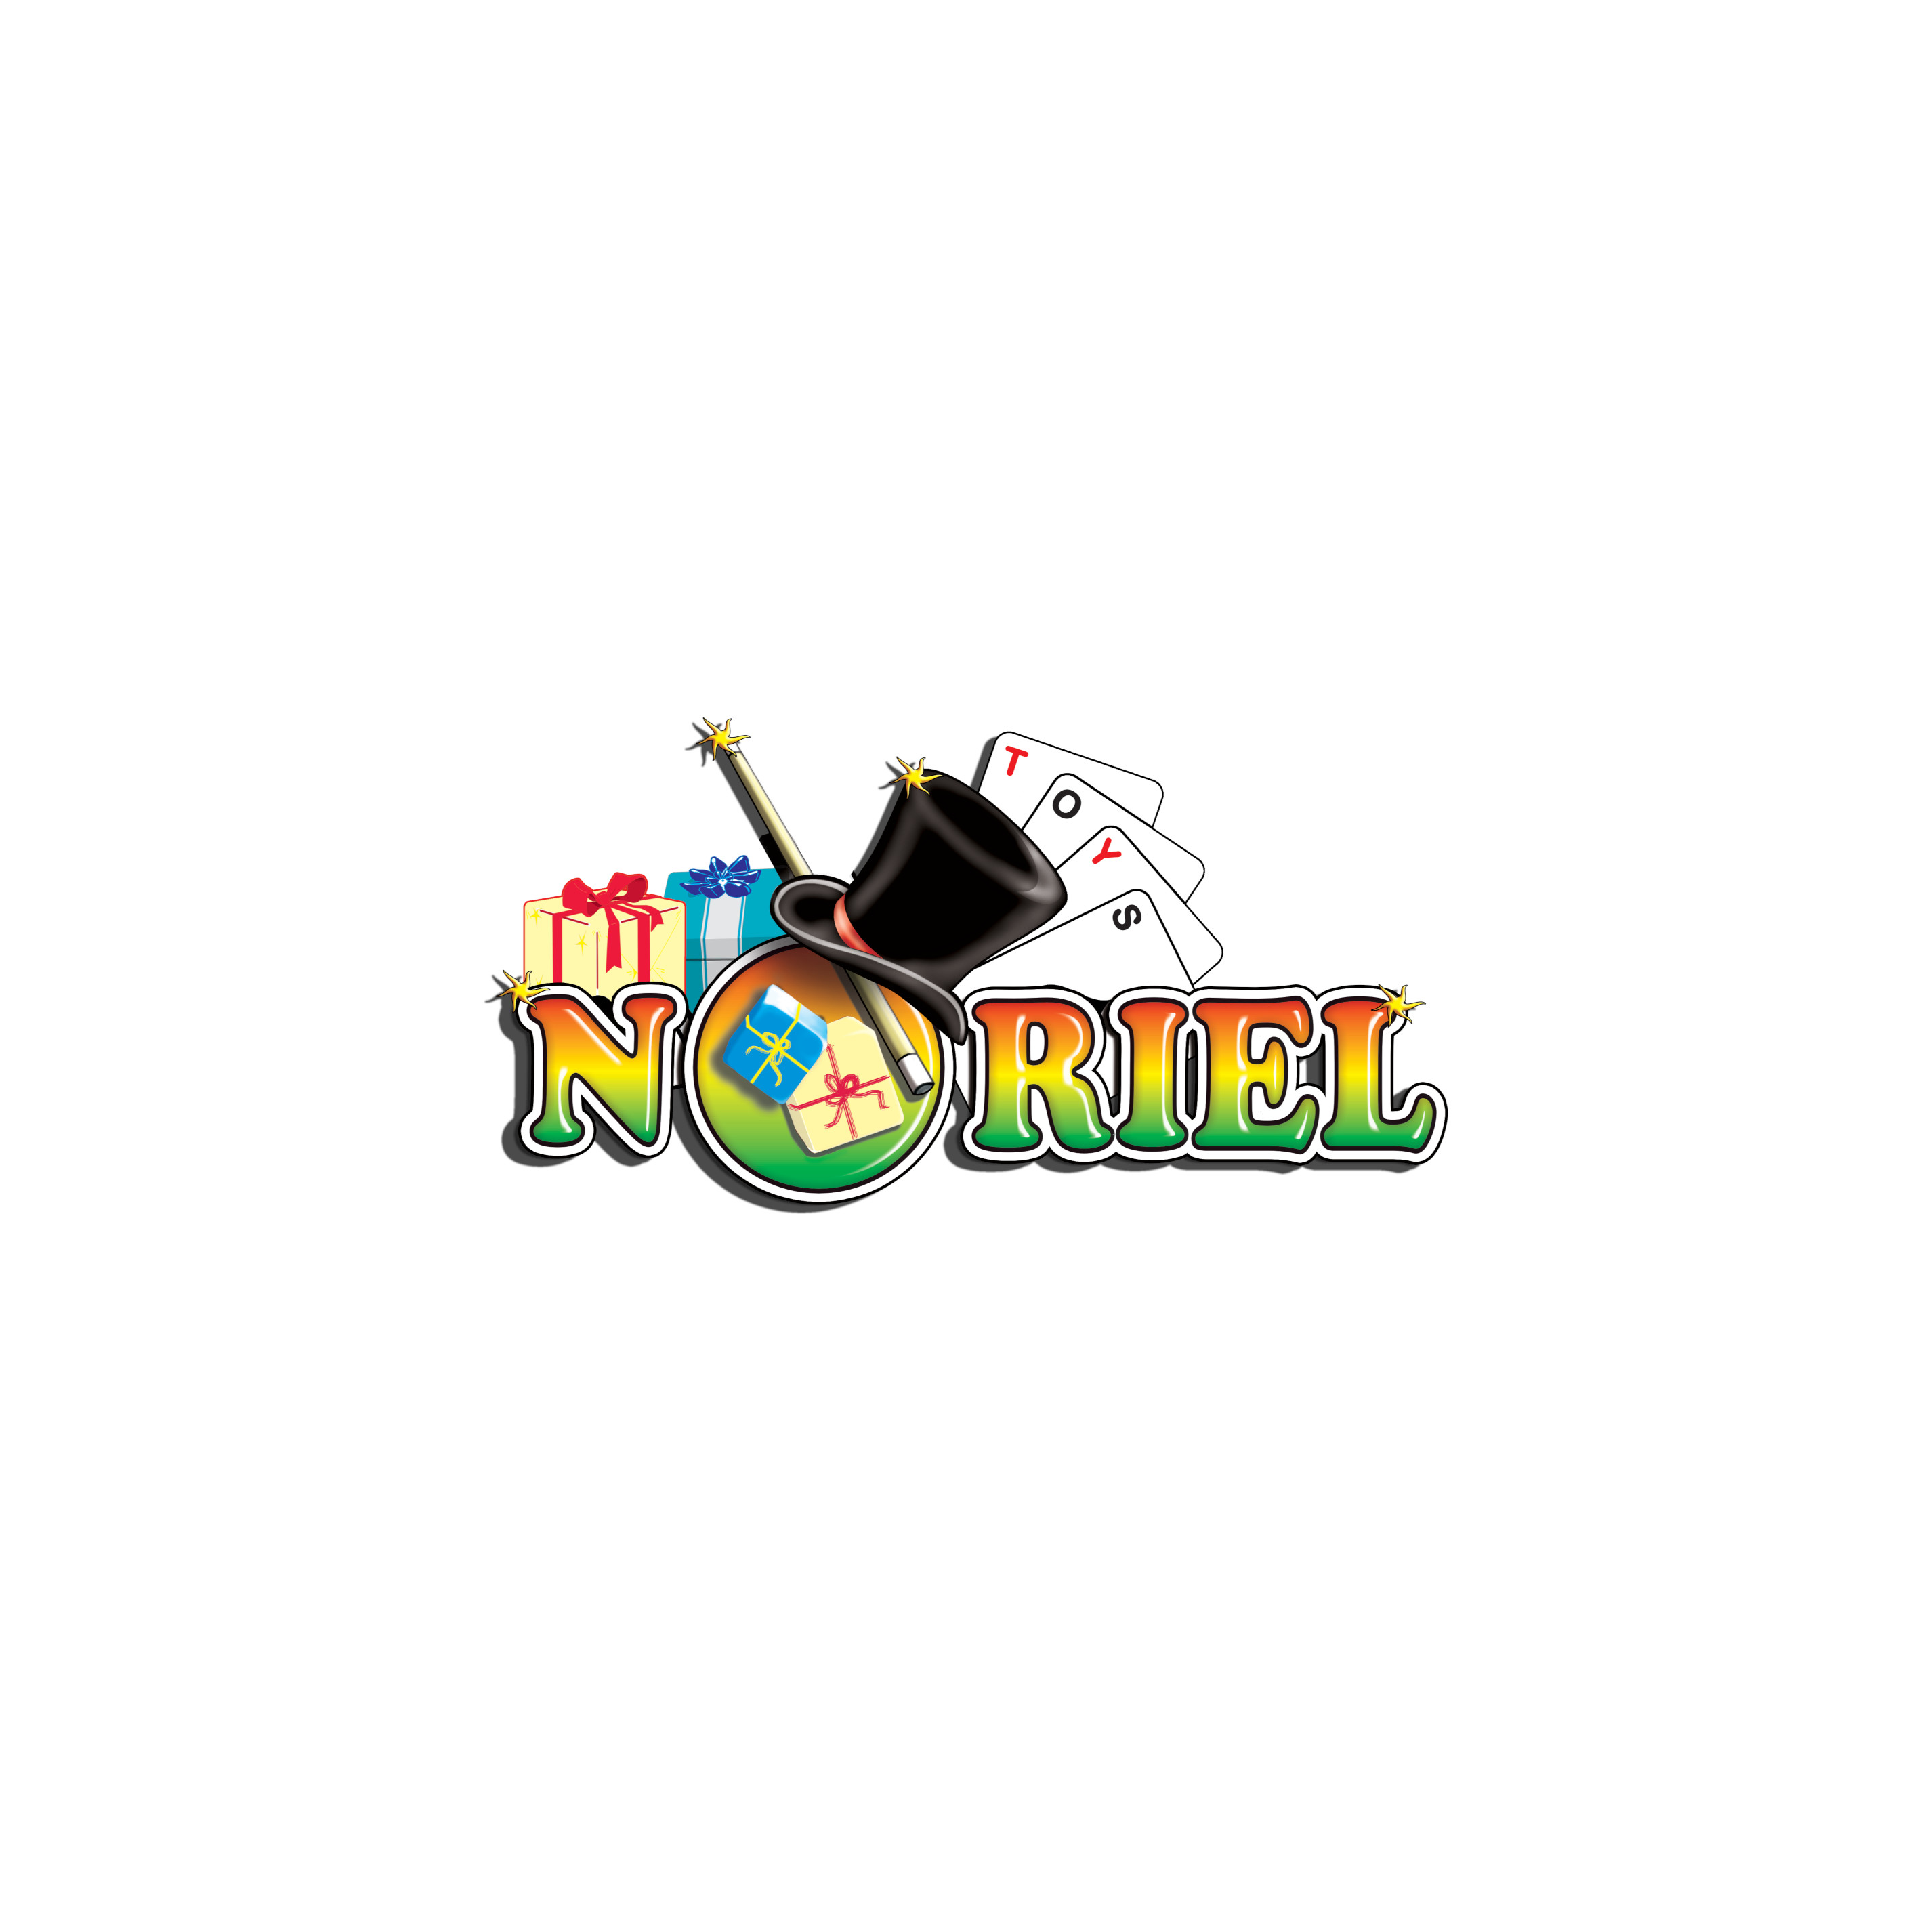 185609_001w Set de joaca Fundita cu surpriza Disney Minnie, Daisy - Bowckets